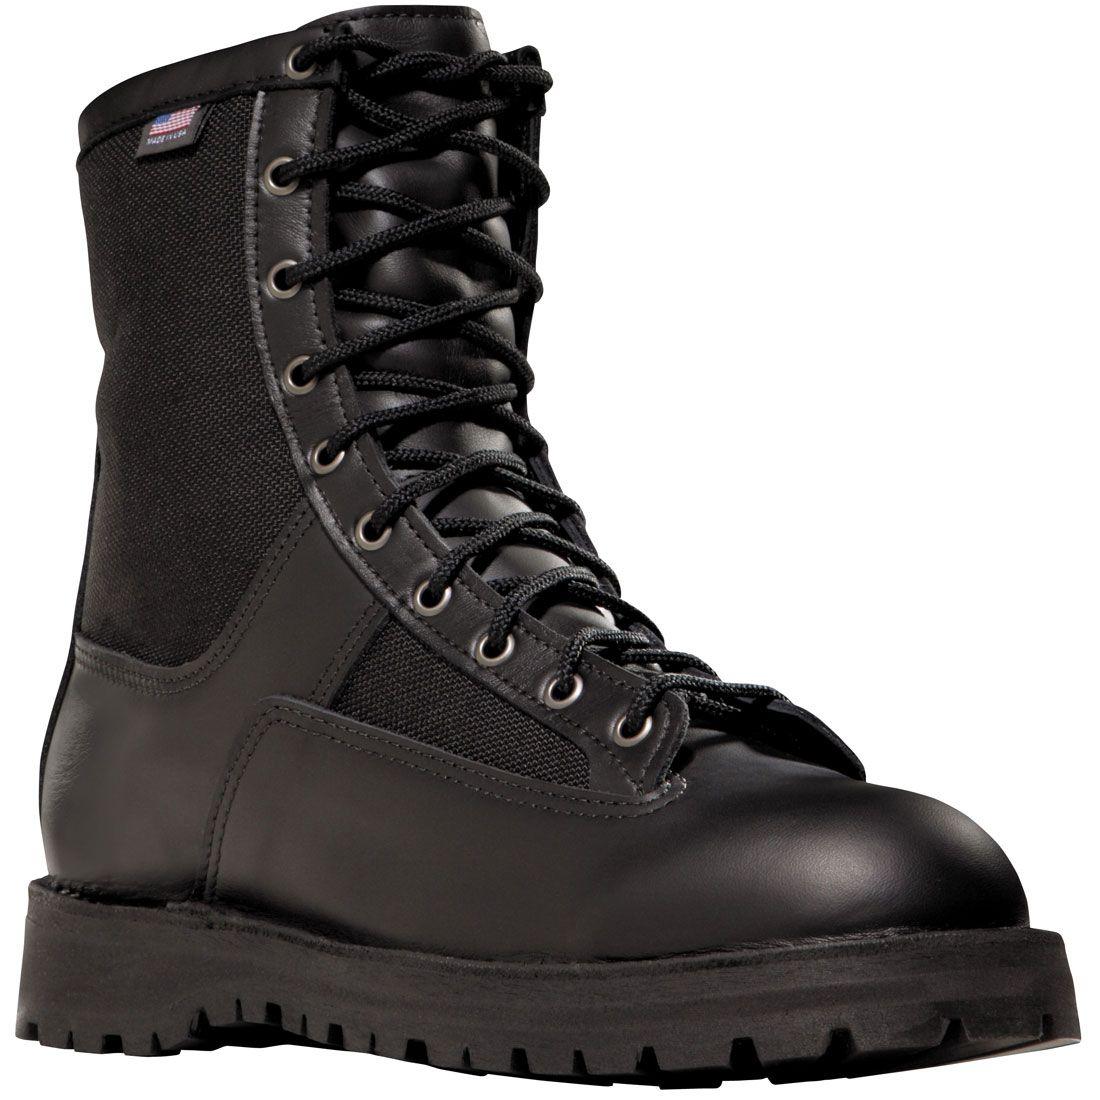 22500 Danner Men's Acadia Uniform Safety Boots Black